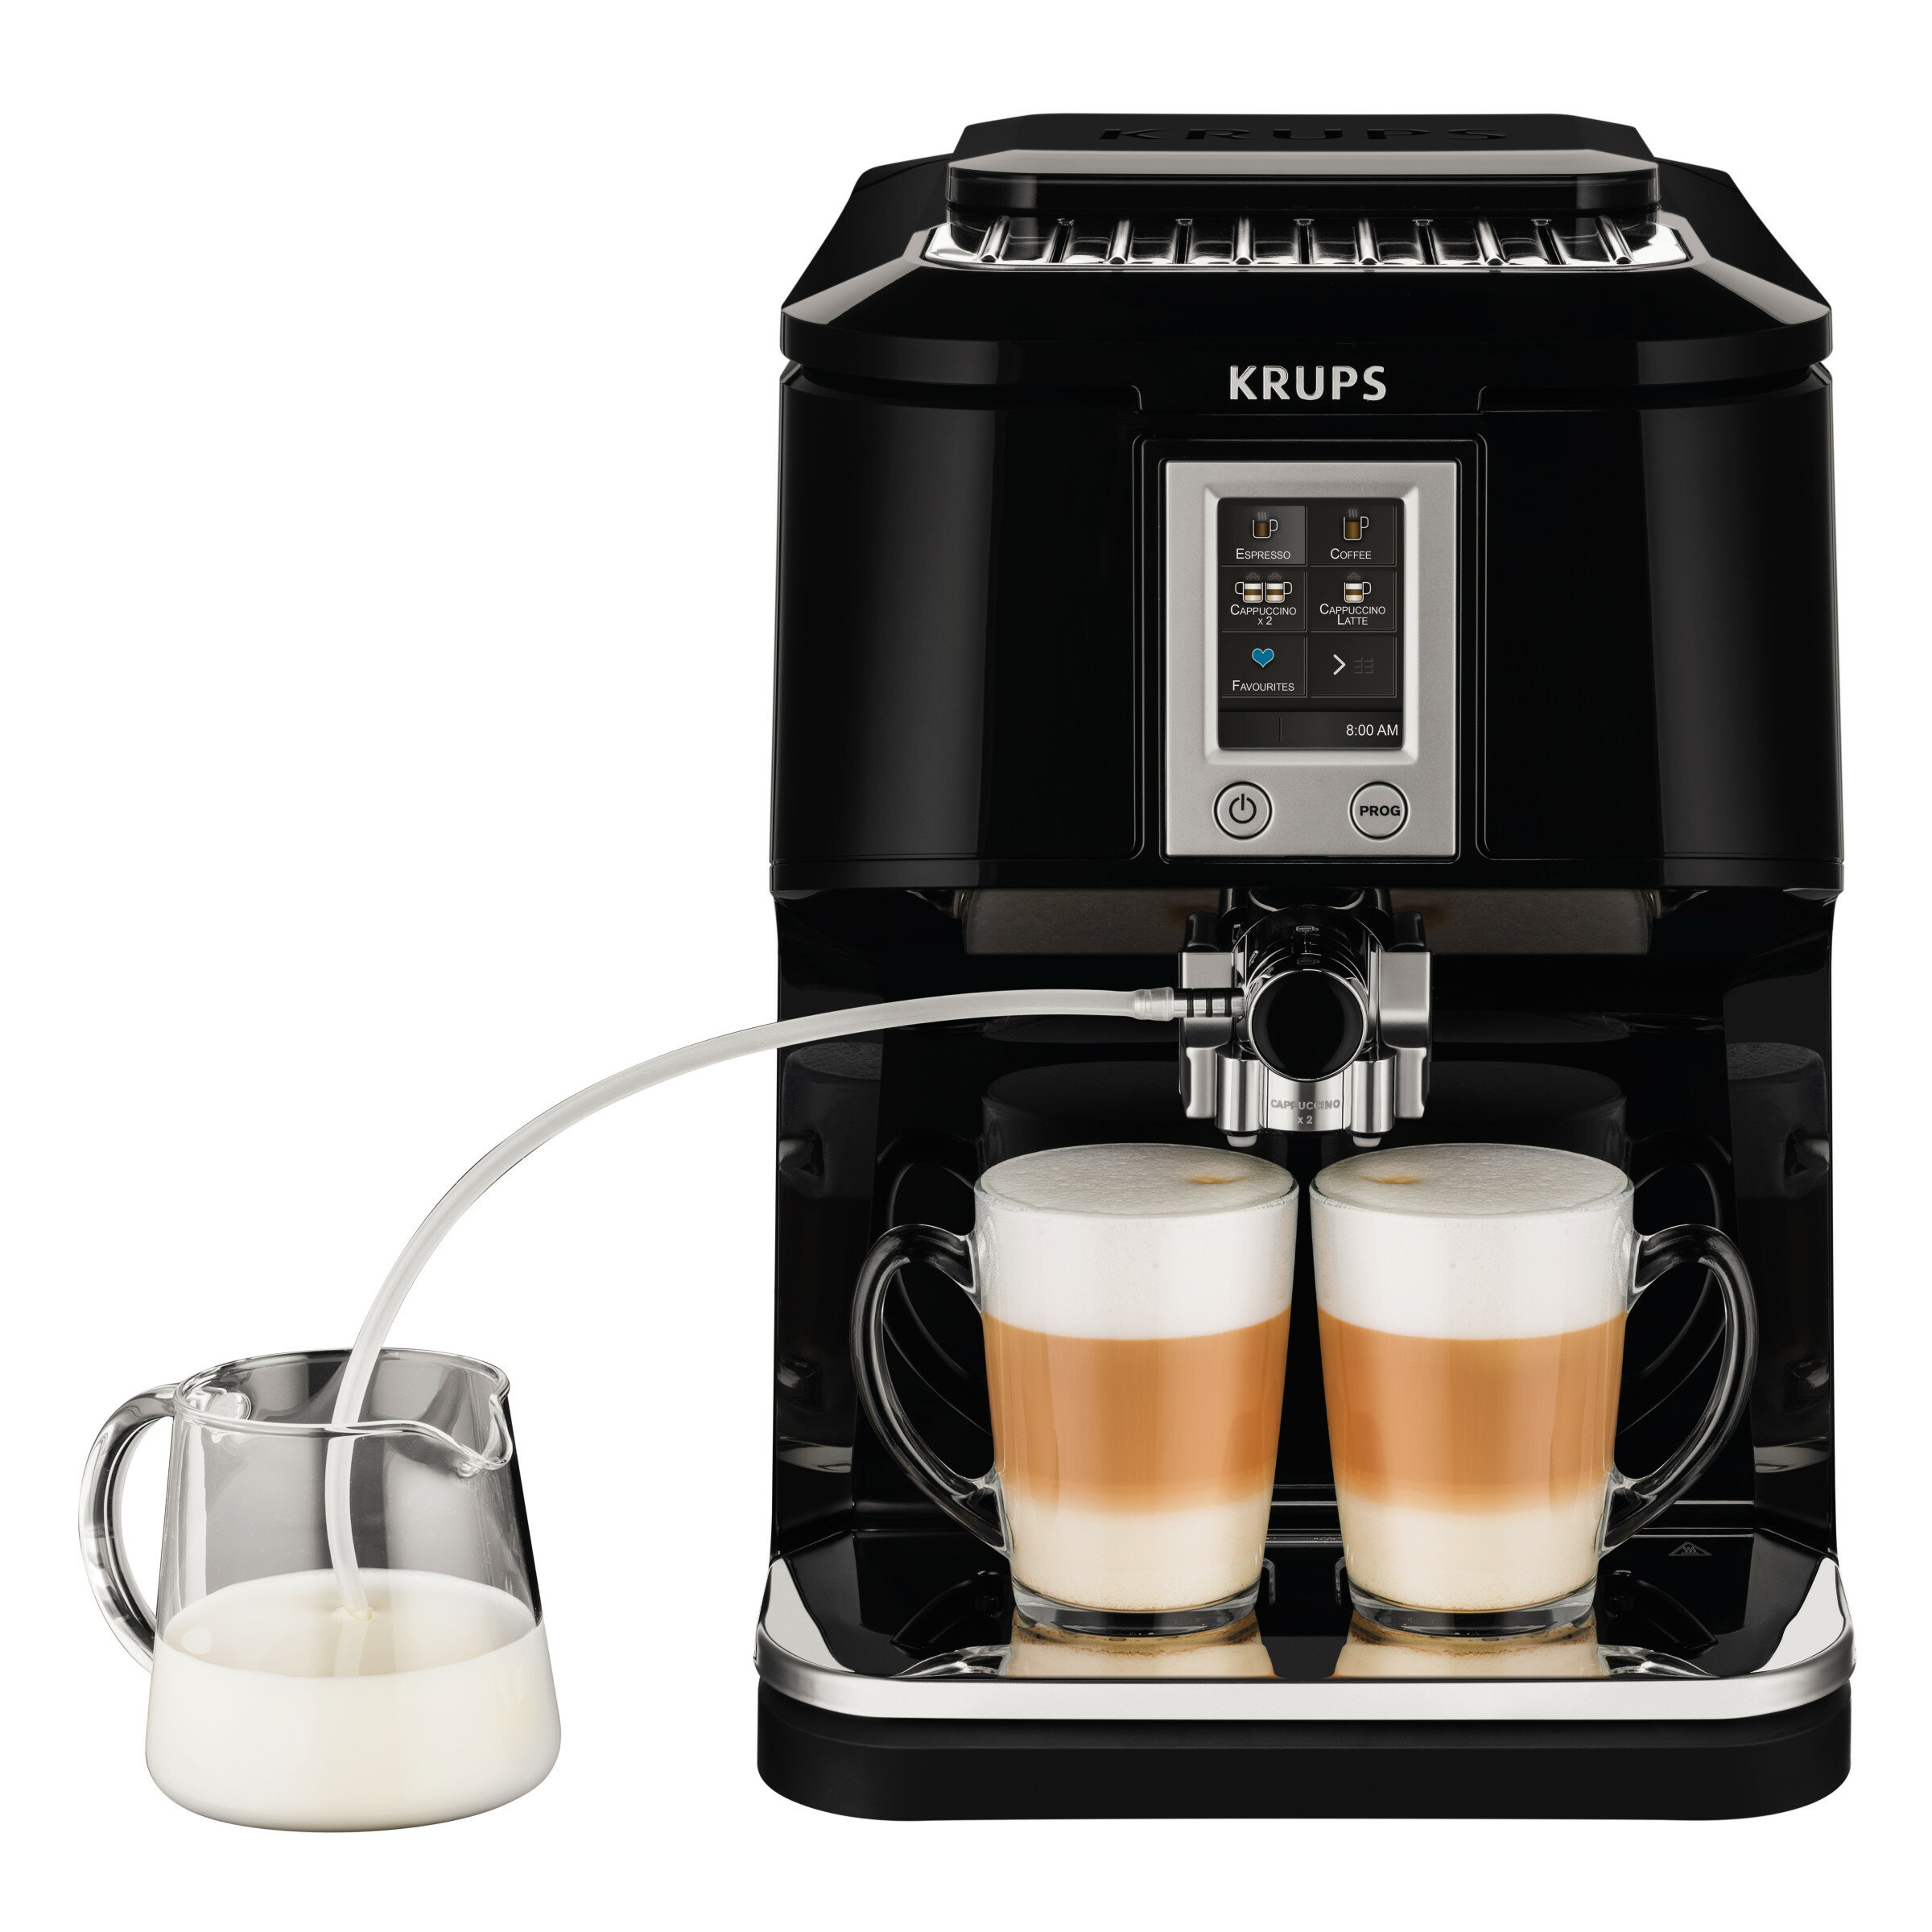 Krups 2 In 1 Touch Automatic Espresso Machine